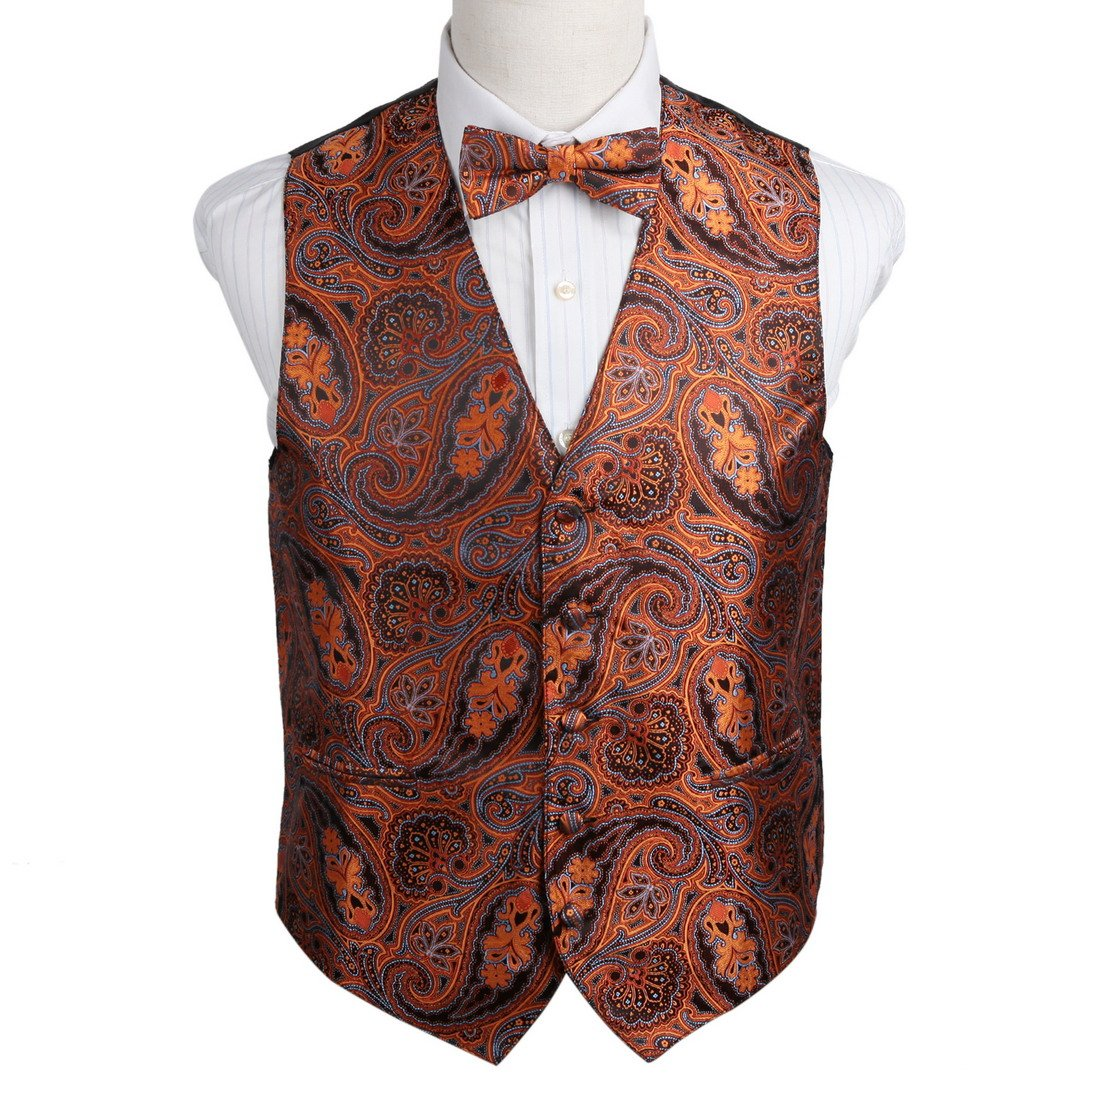 Epoint EGE2B03B-3XL Orange Blue Love for Work-Utility Patterns Microfiber Tuxedo Vest Pre-Tied Bow Tie Set Romance Fabric